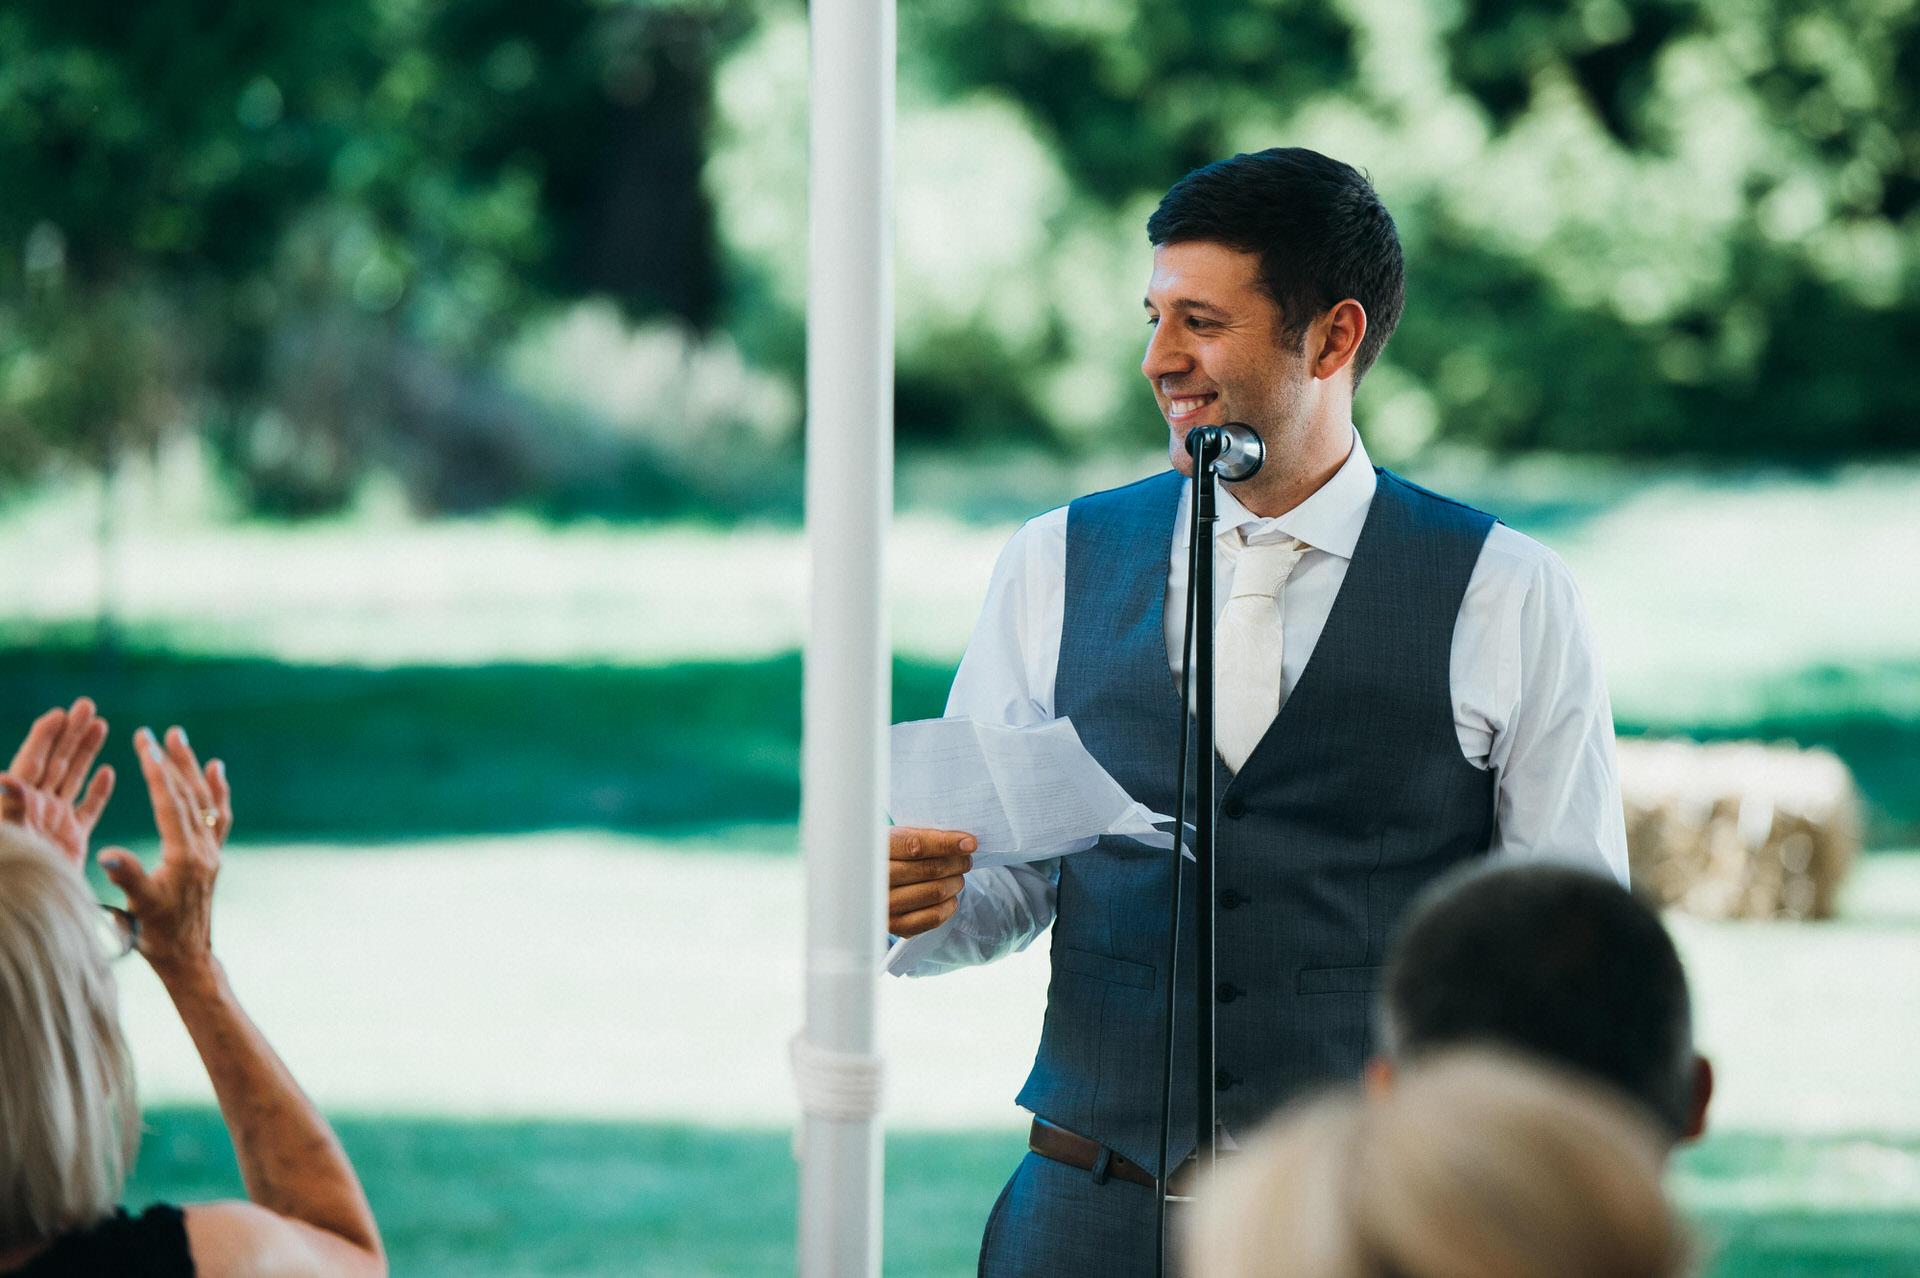 RHS Wisely wedding speech